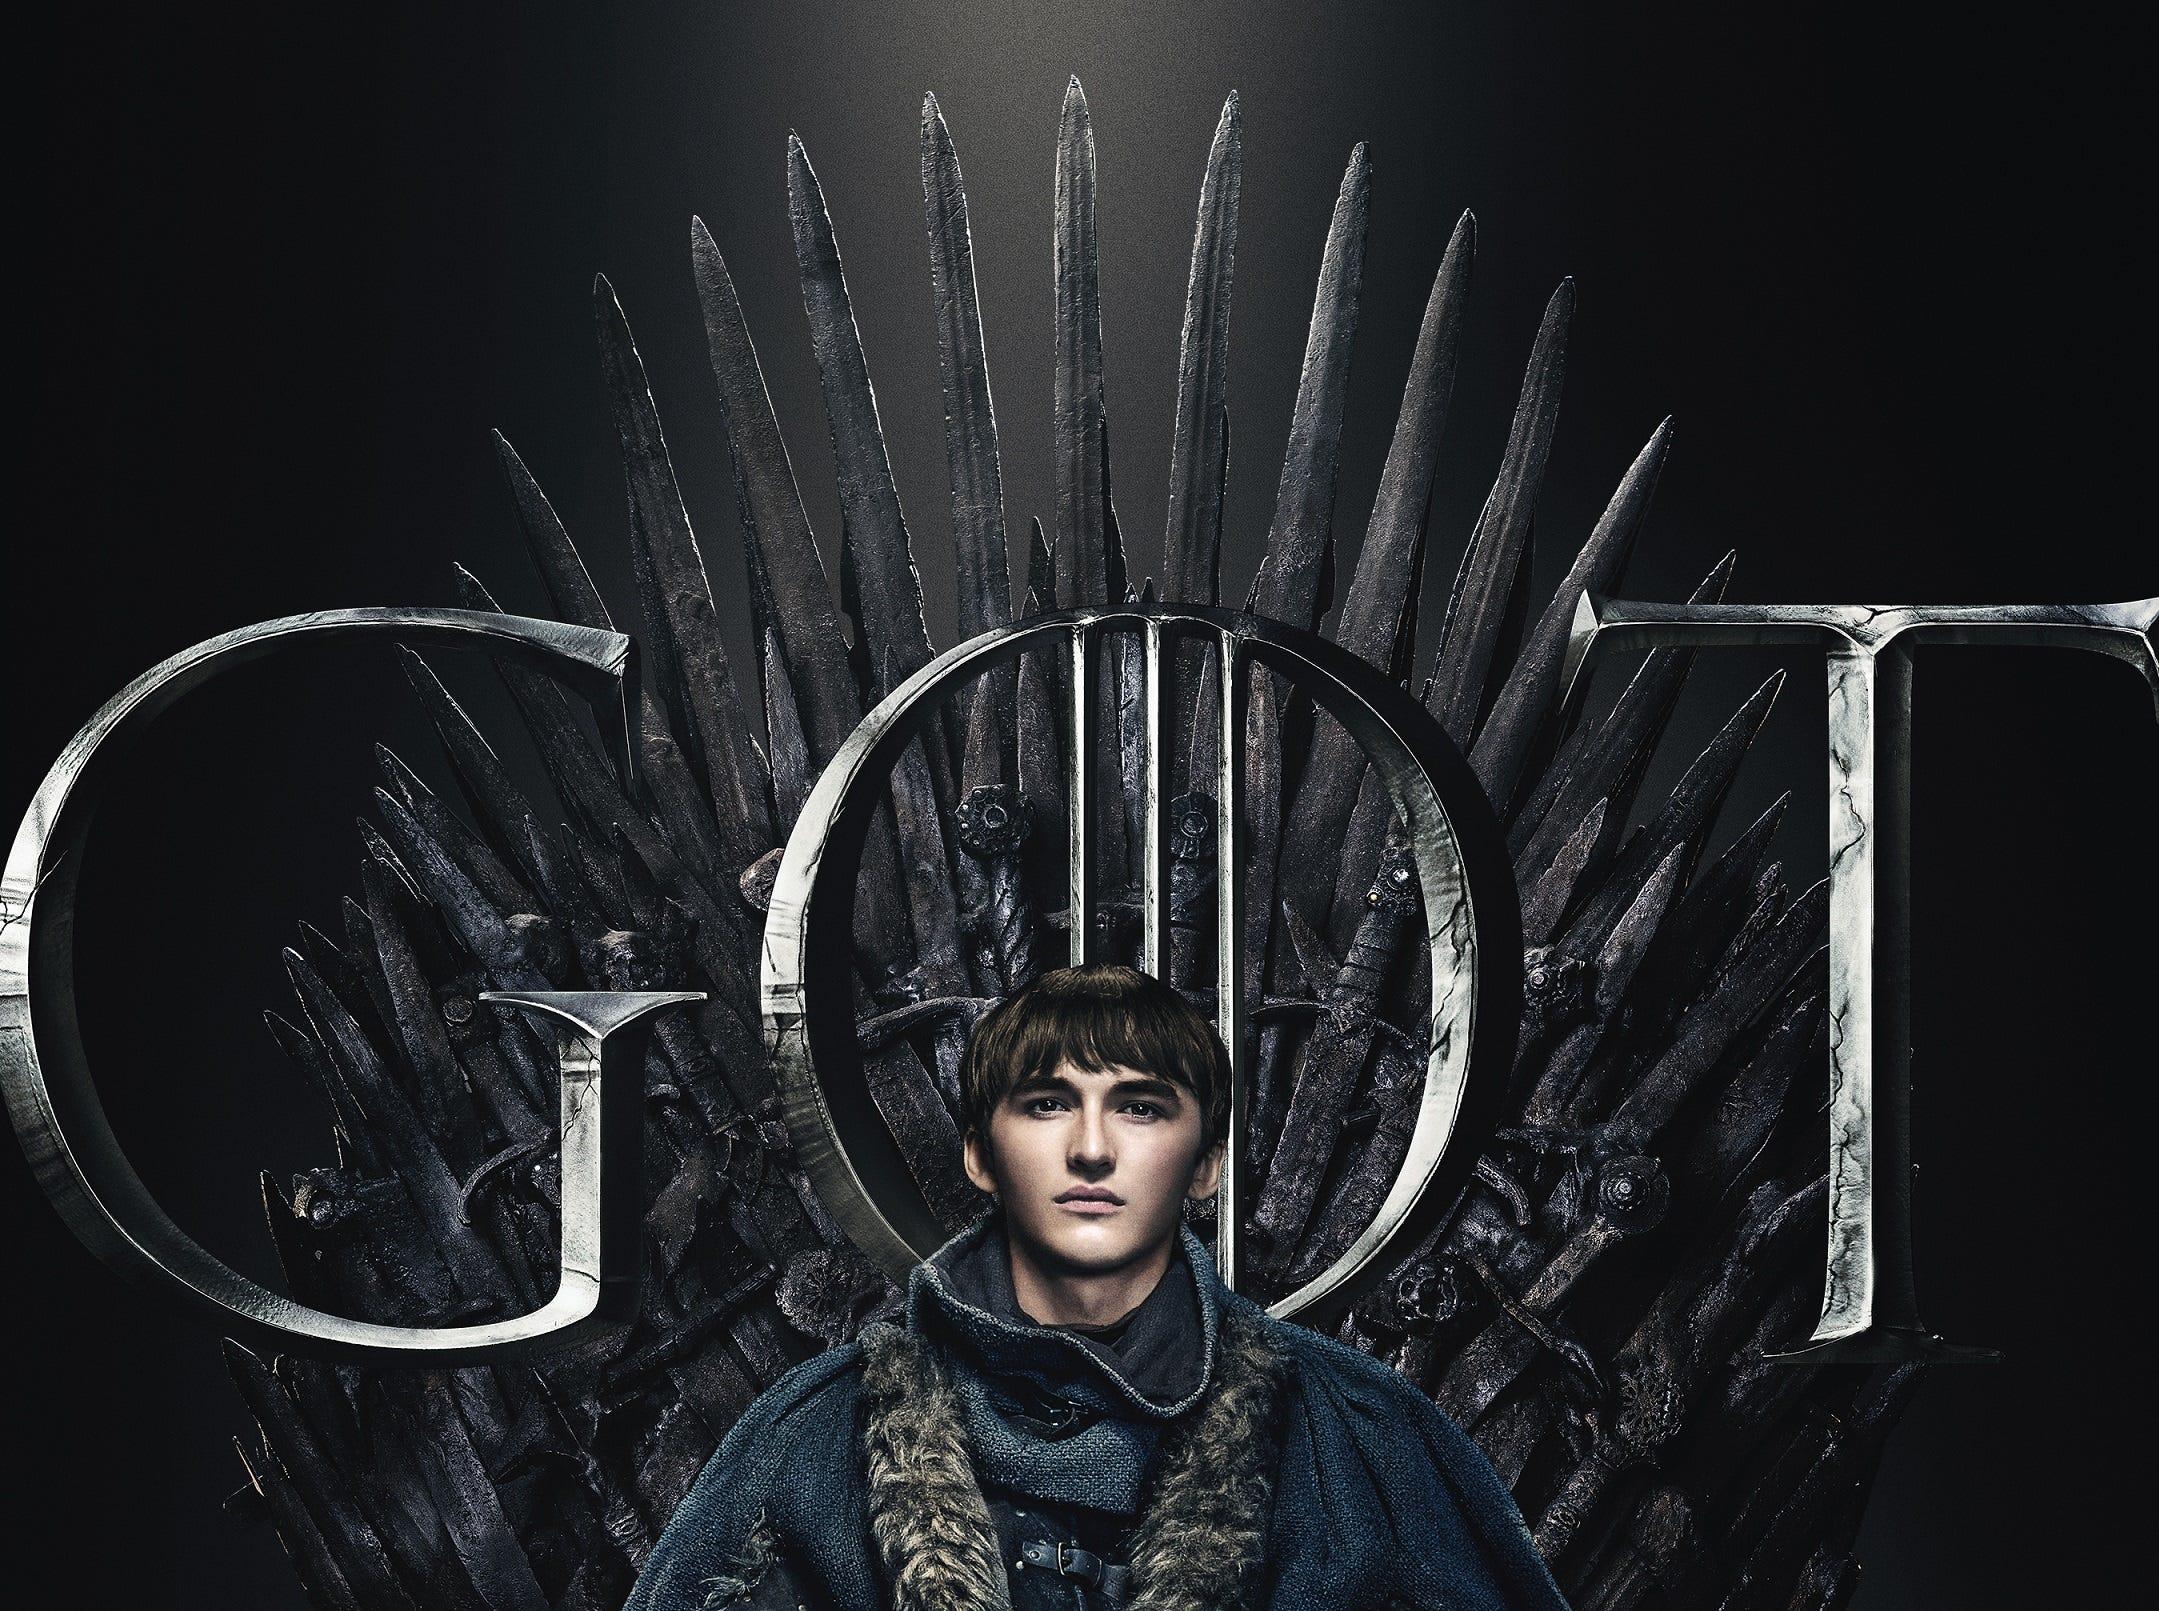 The third remaining Stark child, Bran (Isaac Hempstead-Wright) has the full monk look.